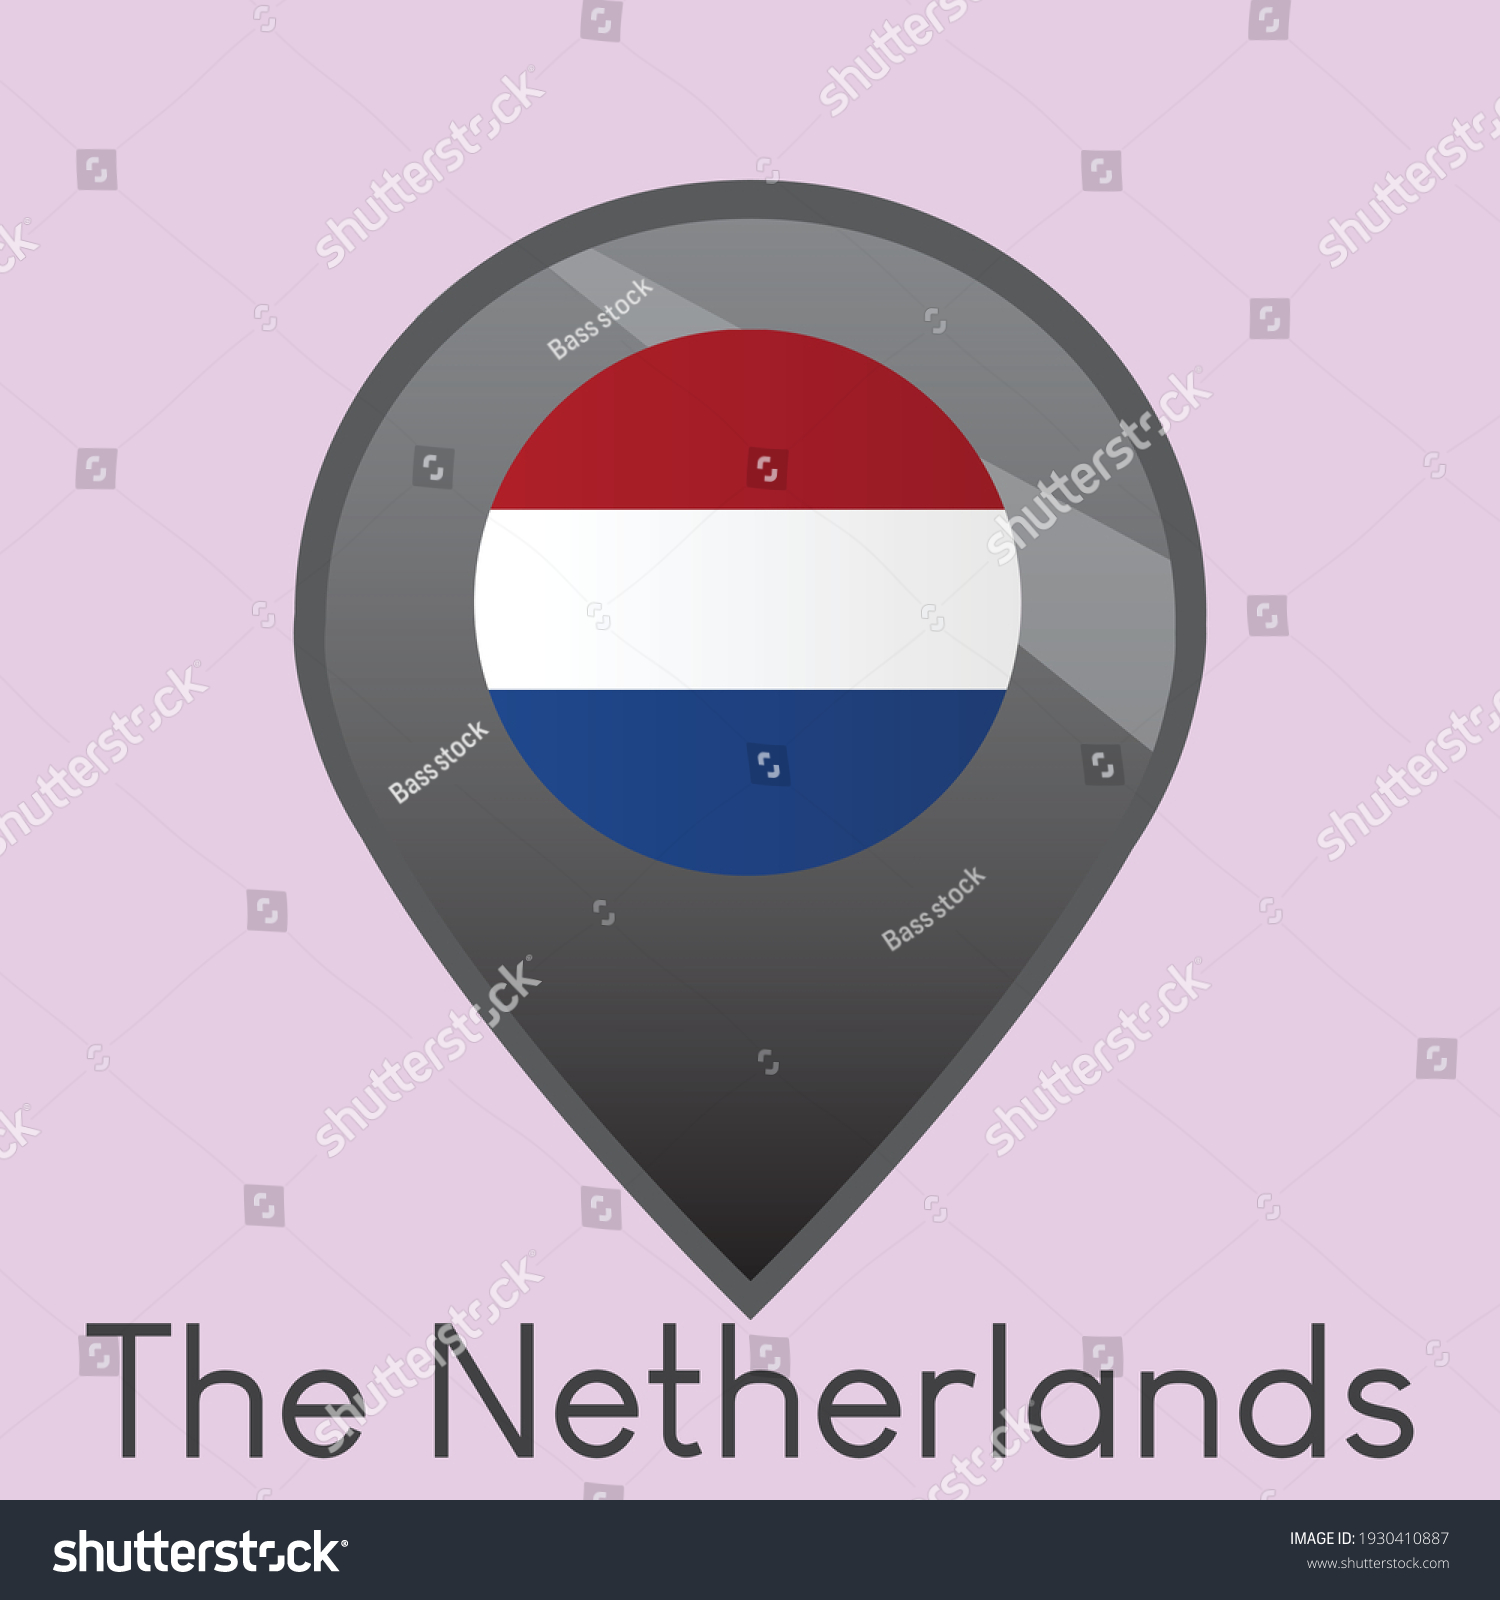 stock-vector-flag-of-the-netherlands-location-pin-icon-design-simple-dark-gradient-vector-illustration-eps-1930410887.jpg